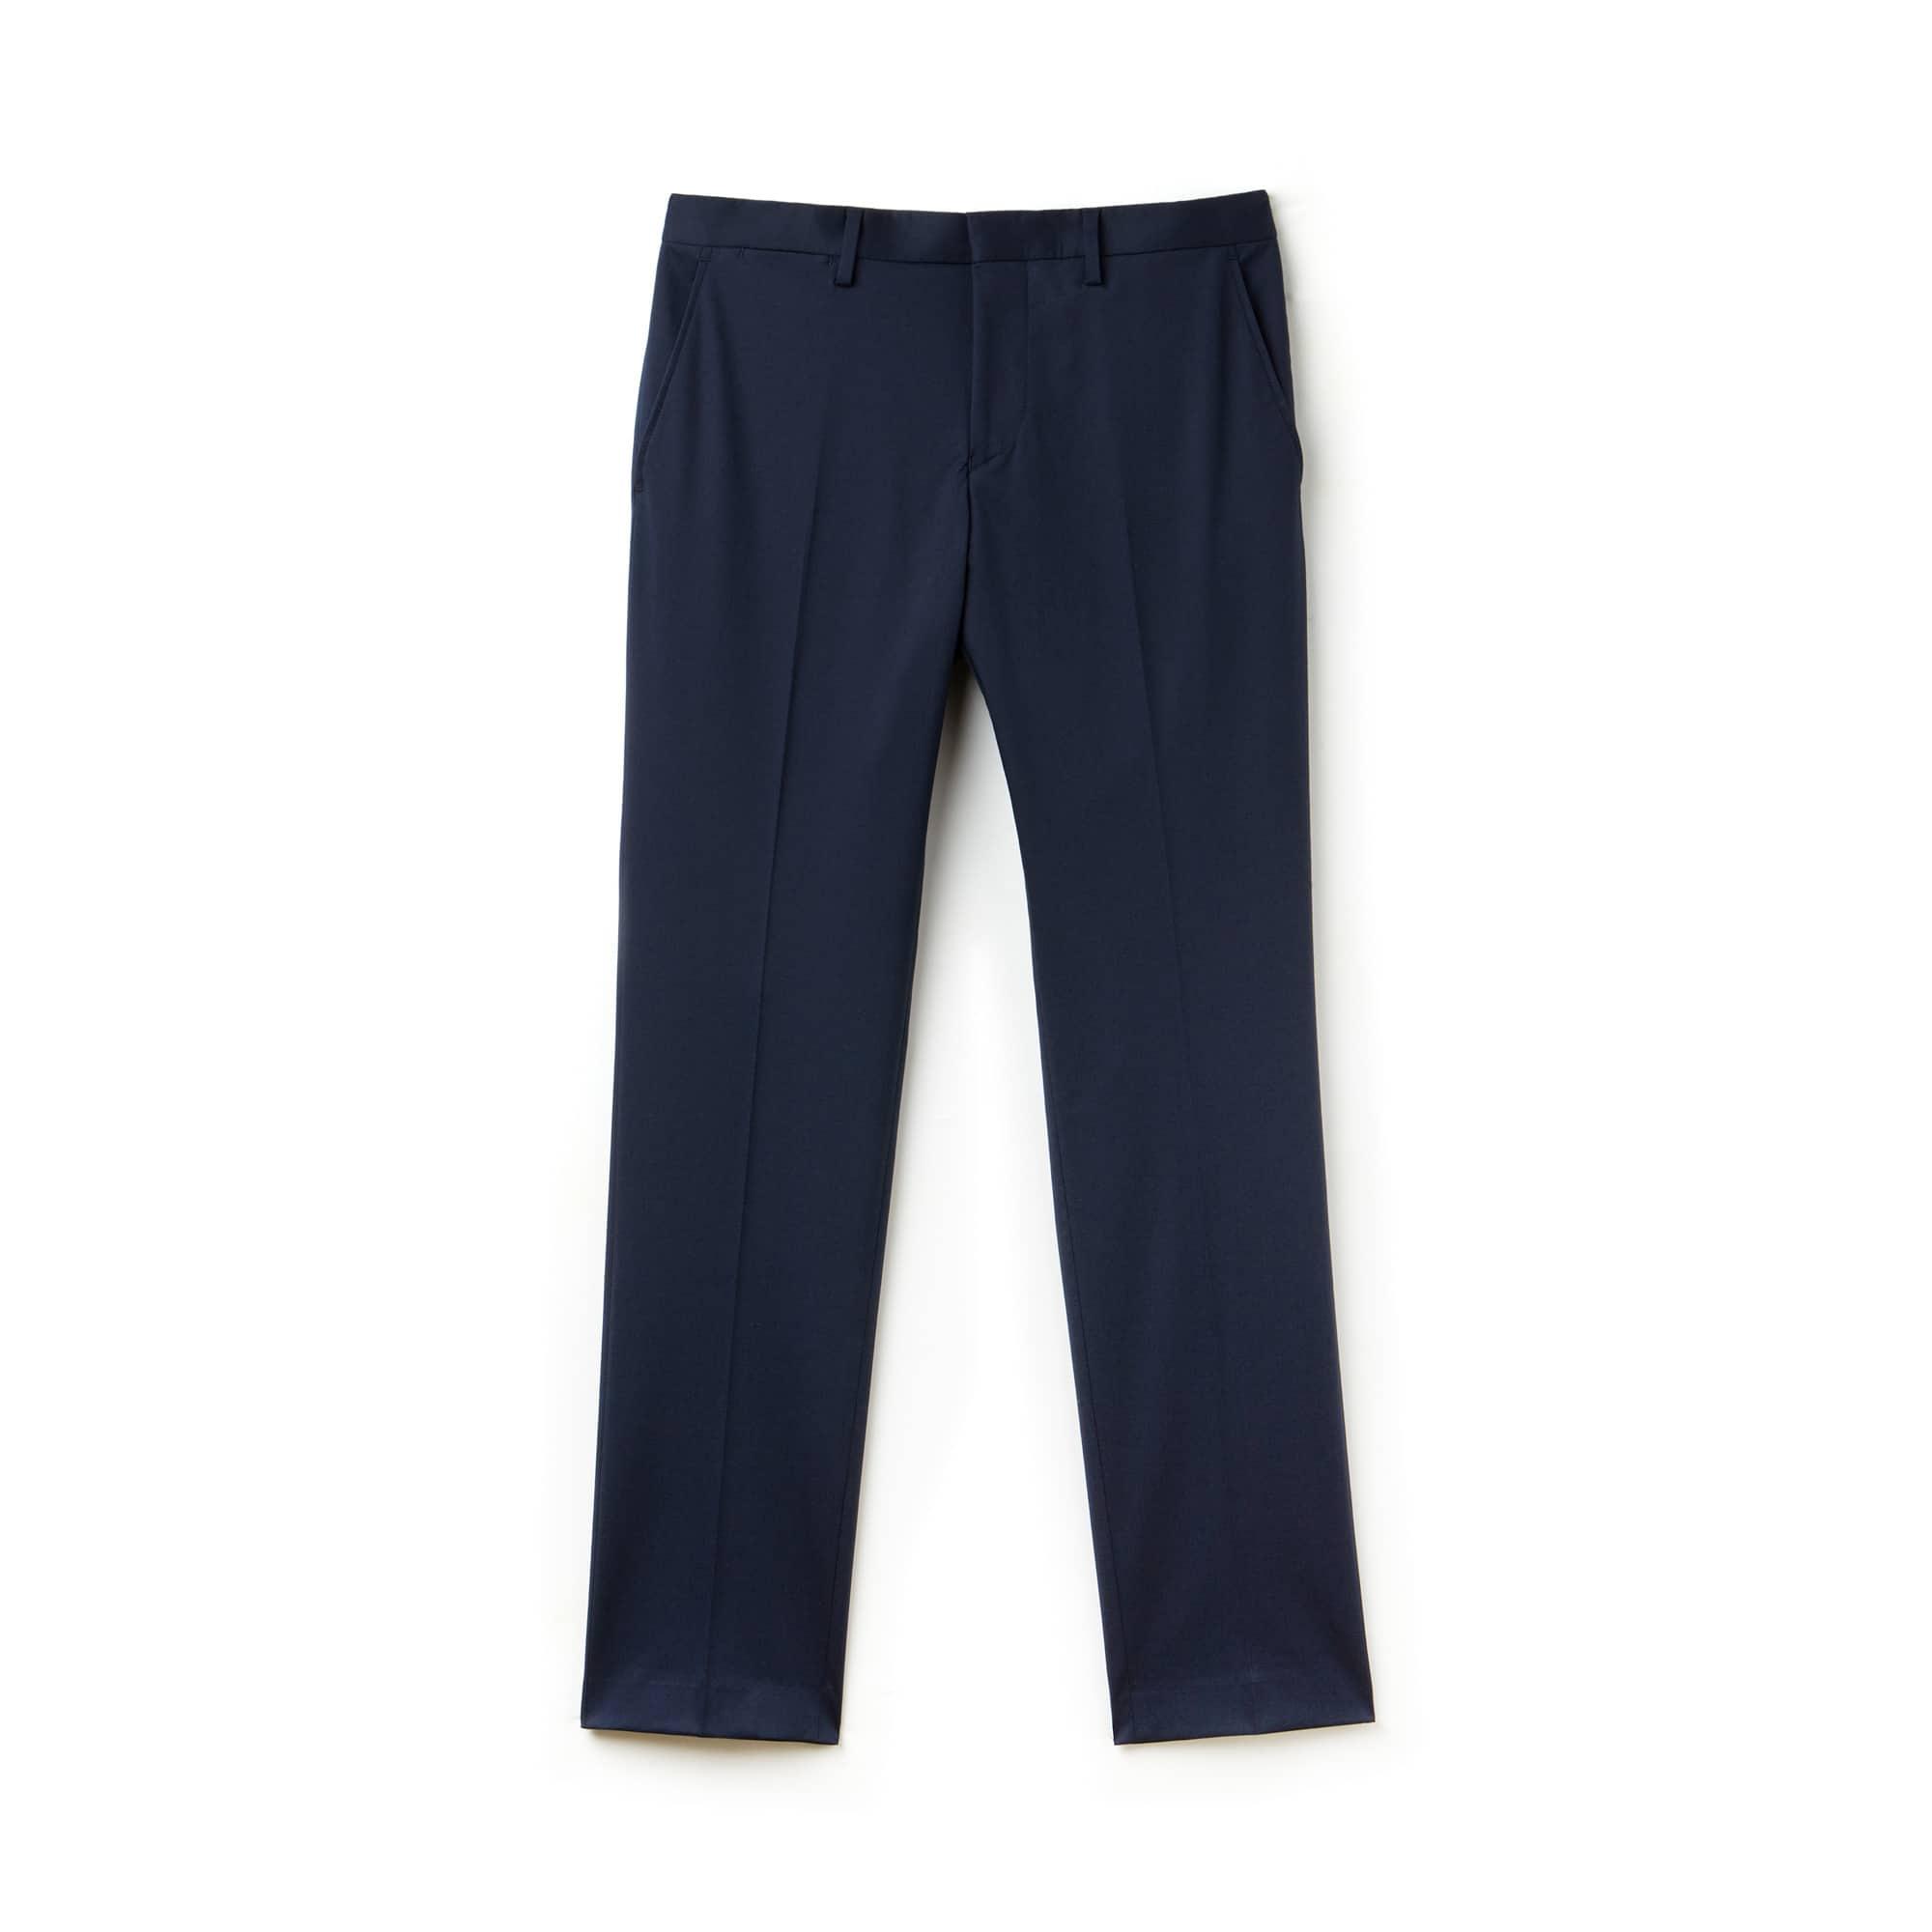 Men's Slim Fit Gabardine Pleated Chino Pants